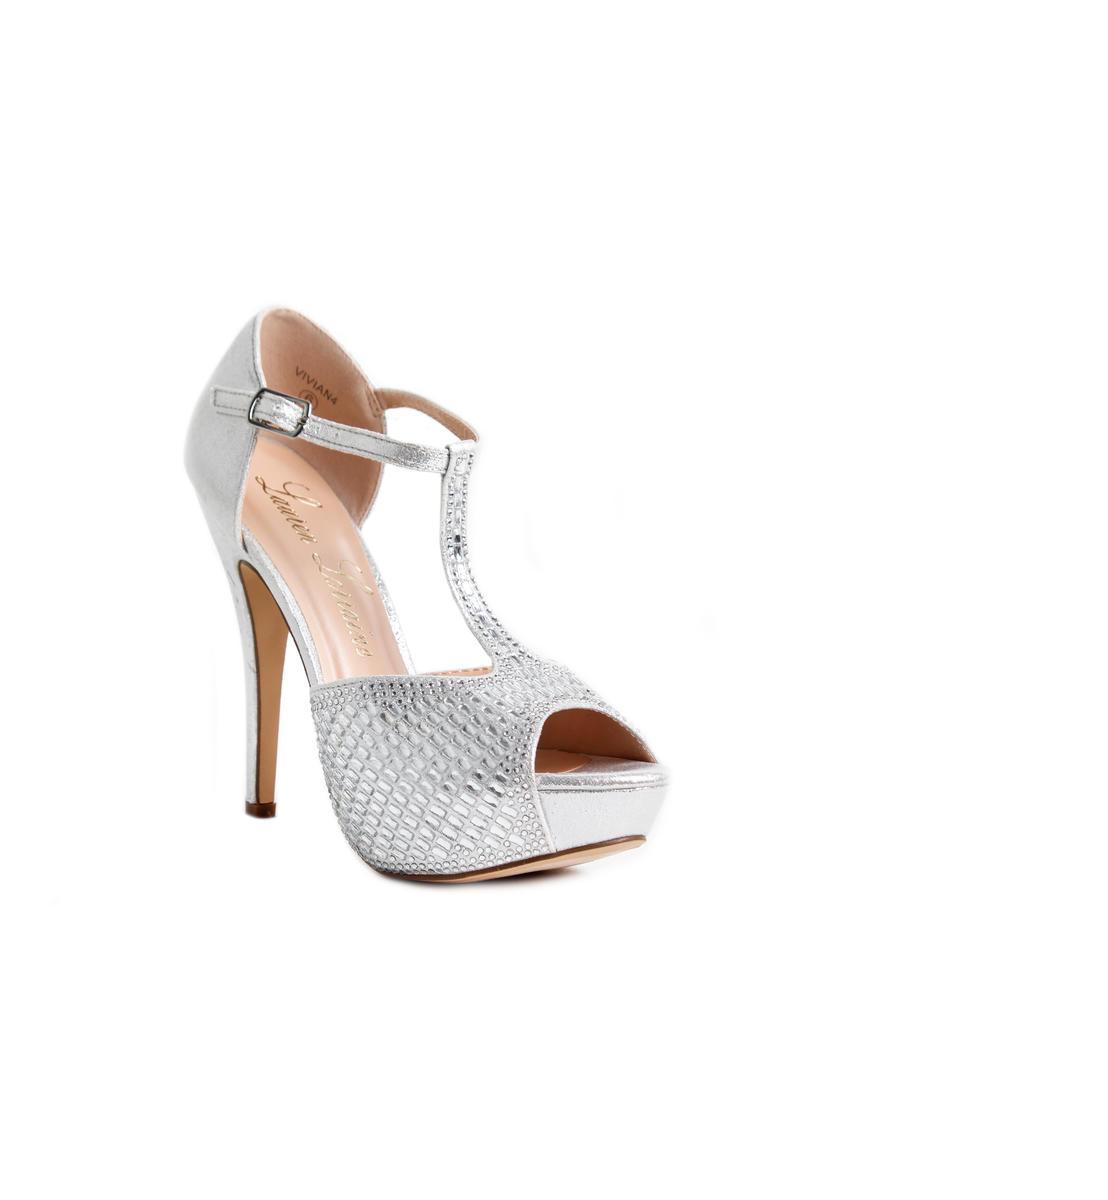 Rhinestone T-Strap Shimmer High Heel